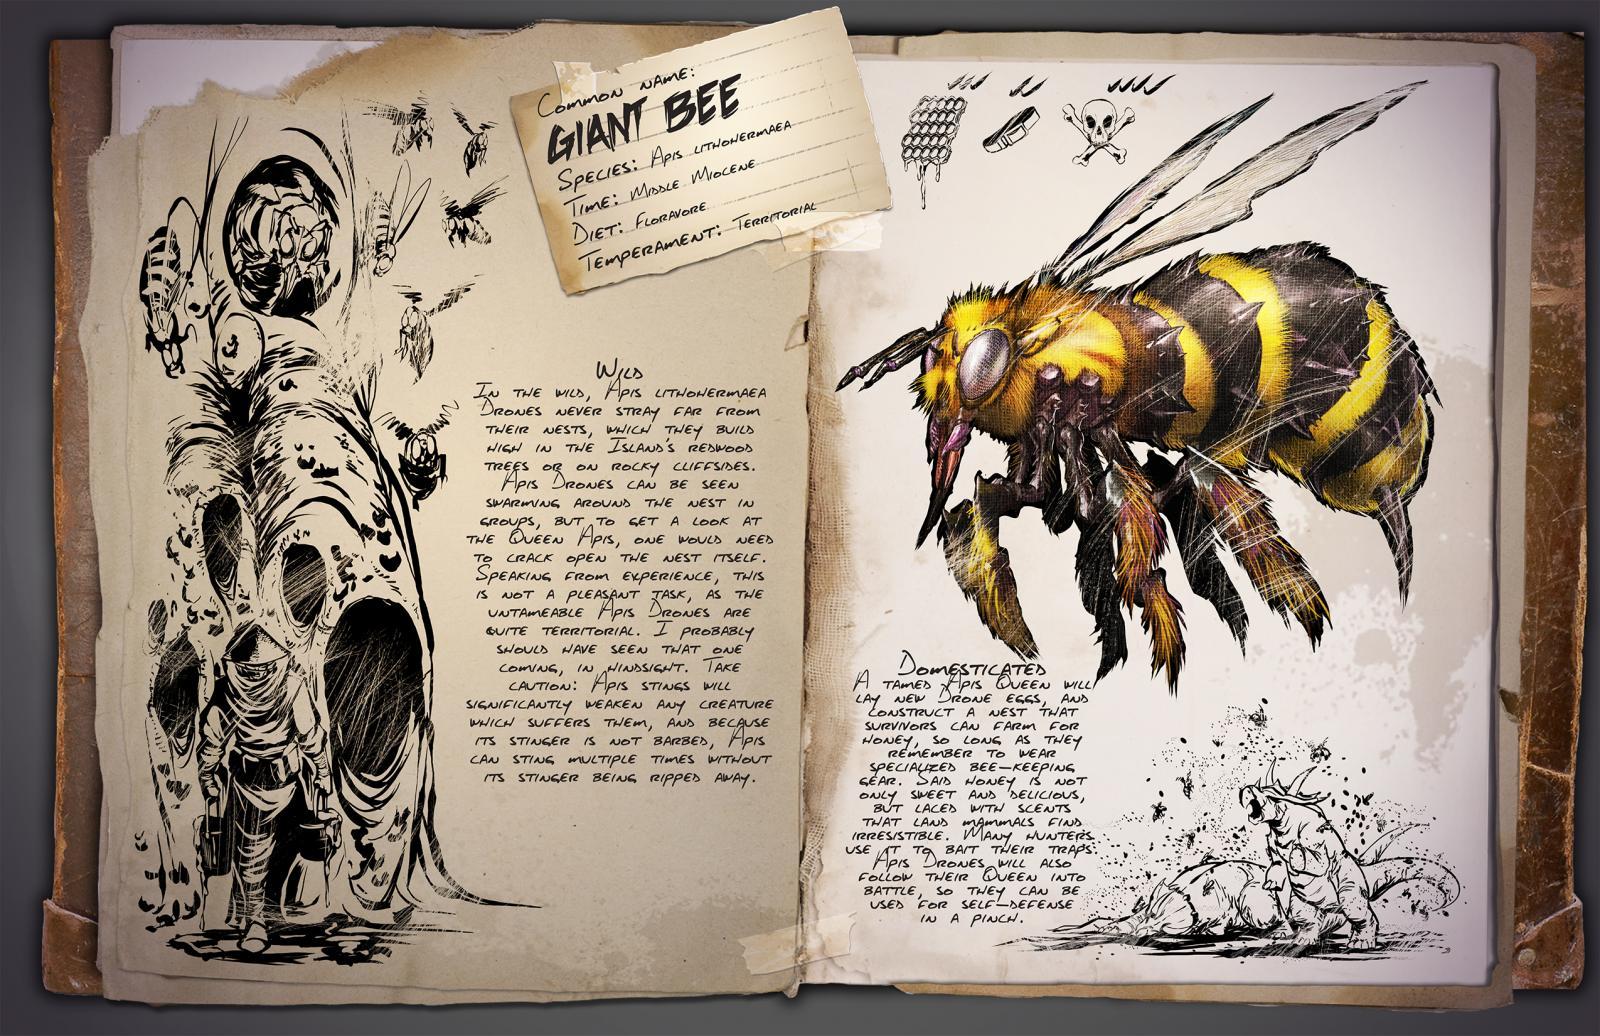 Deutsches Dino Dossier: Giant Bee (Riesige Biene)